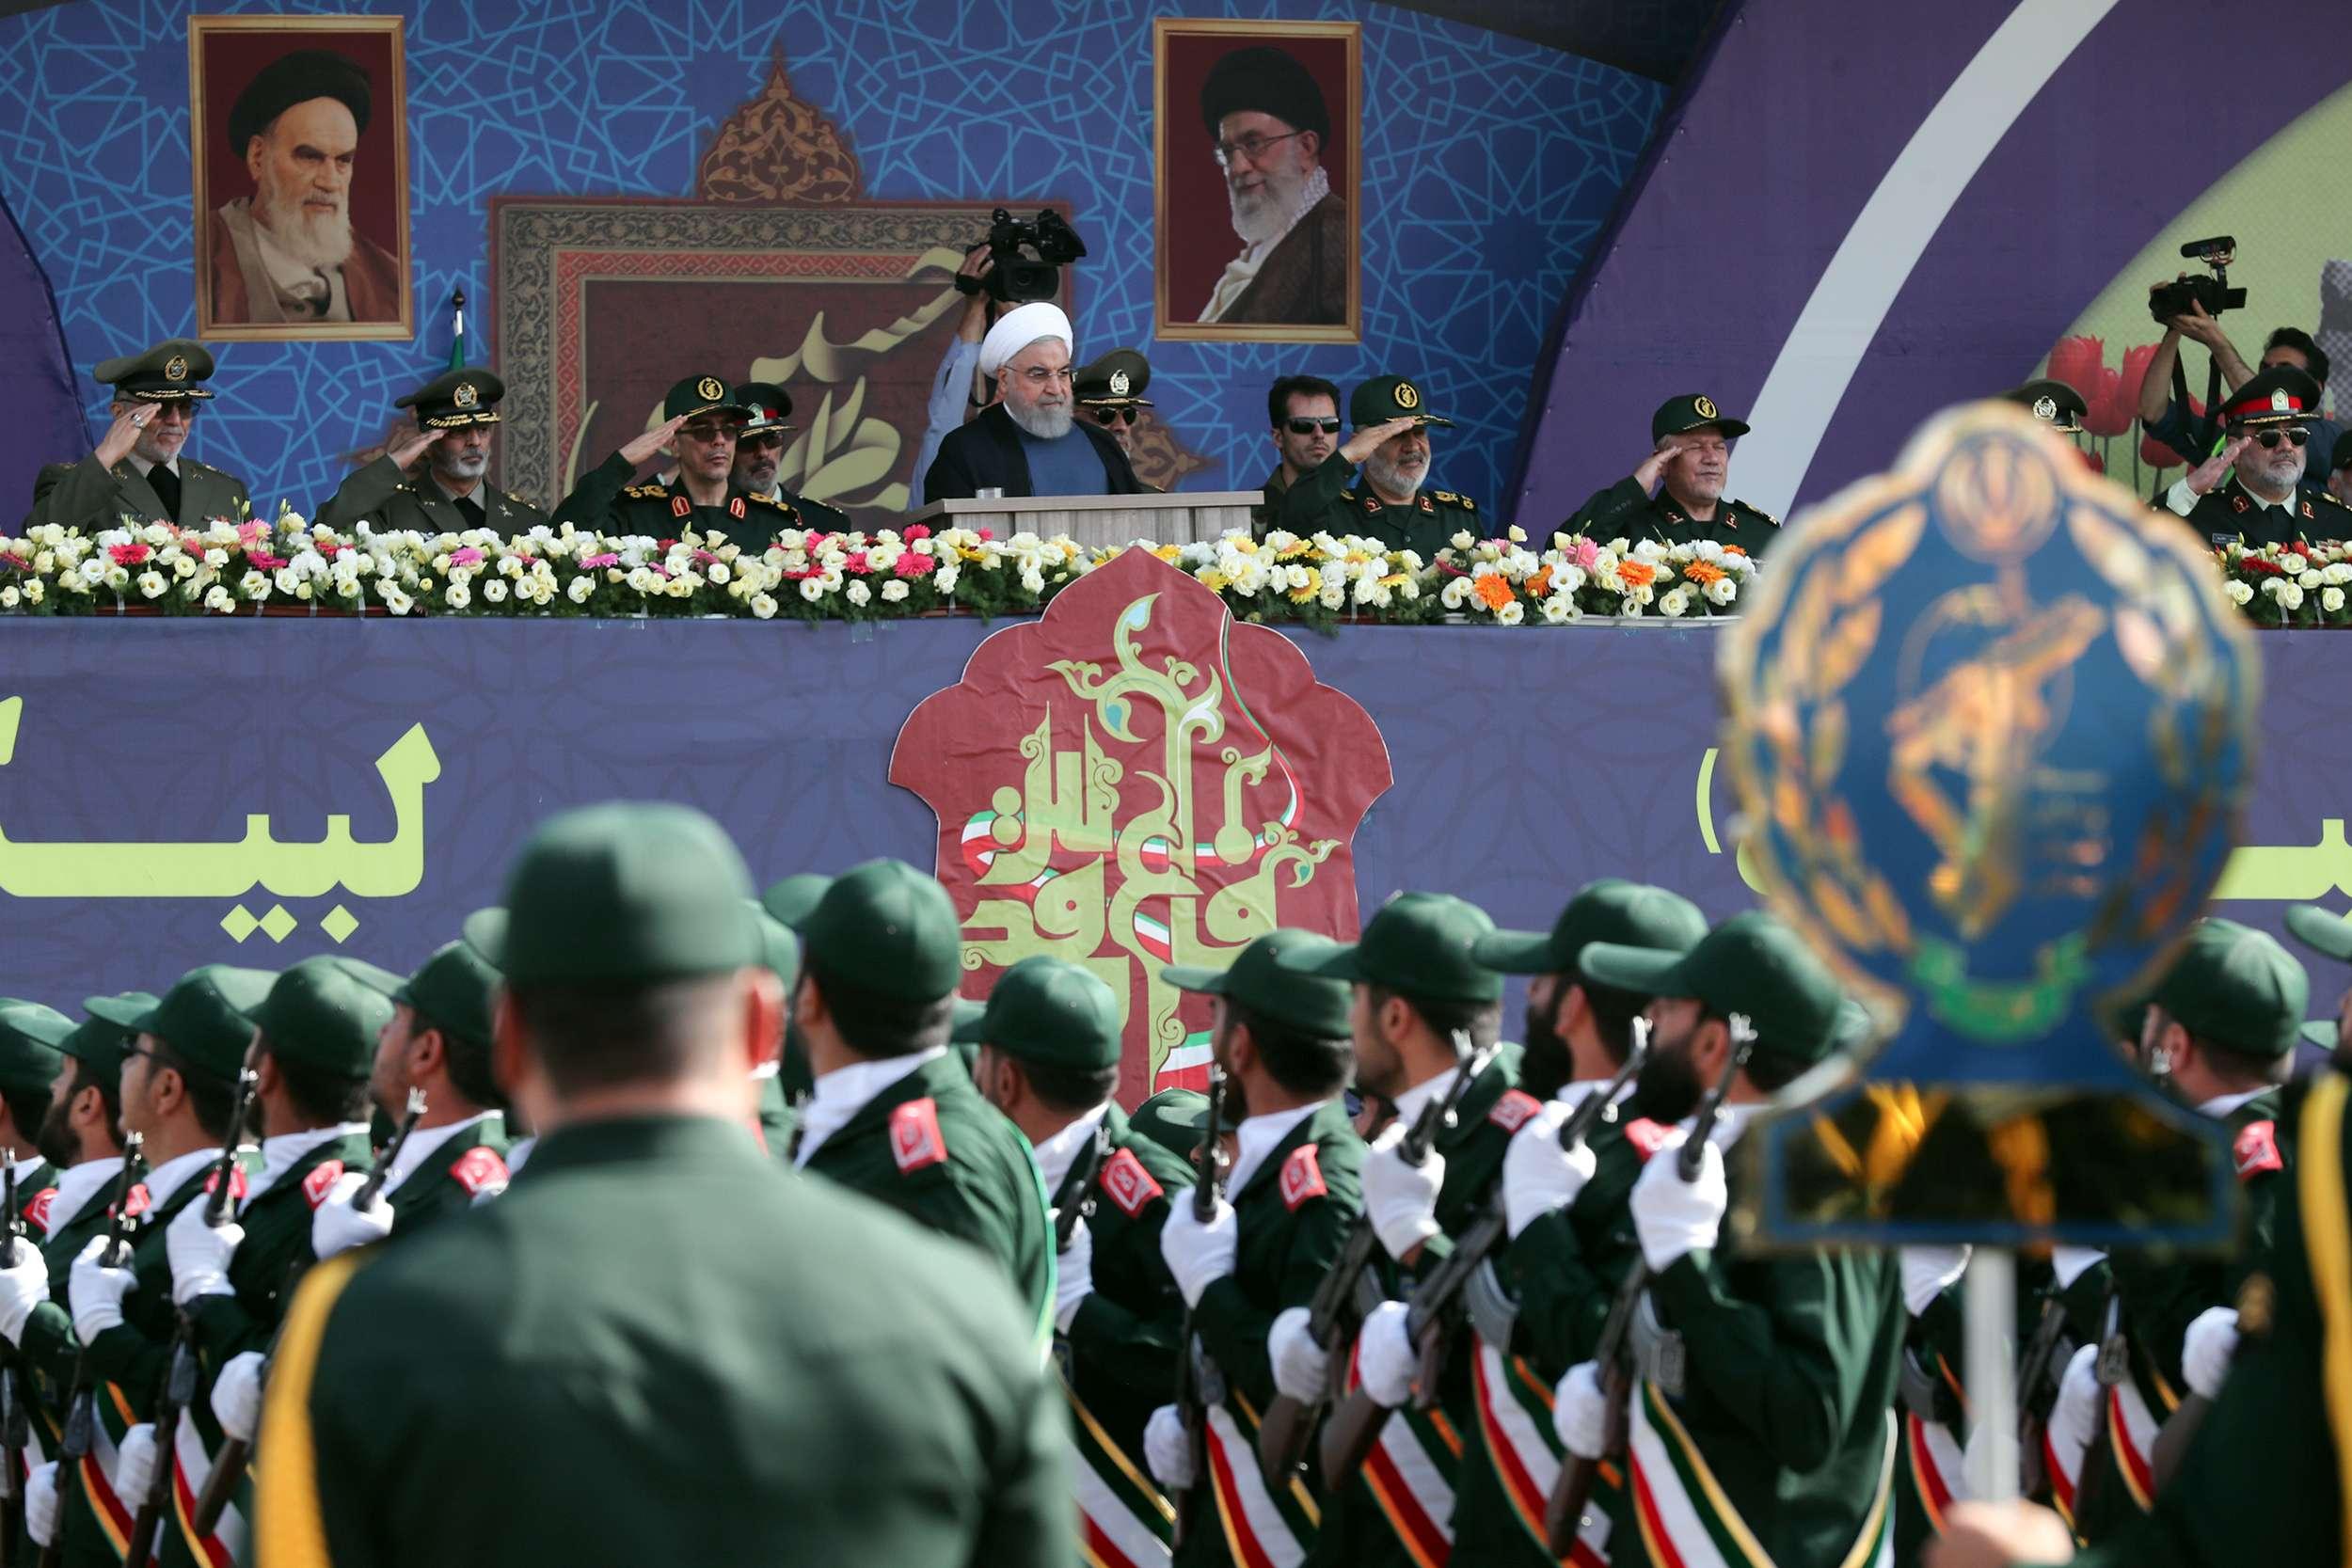 20190922093430reup--2019-09-22t093310z_1255690443_rc1653b3be20_rtrmadp_3_iran-army-day.h